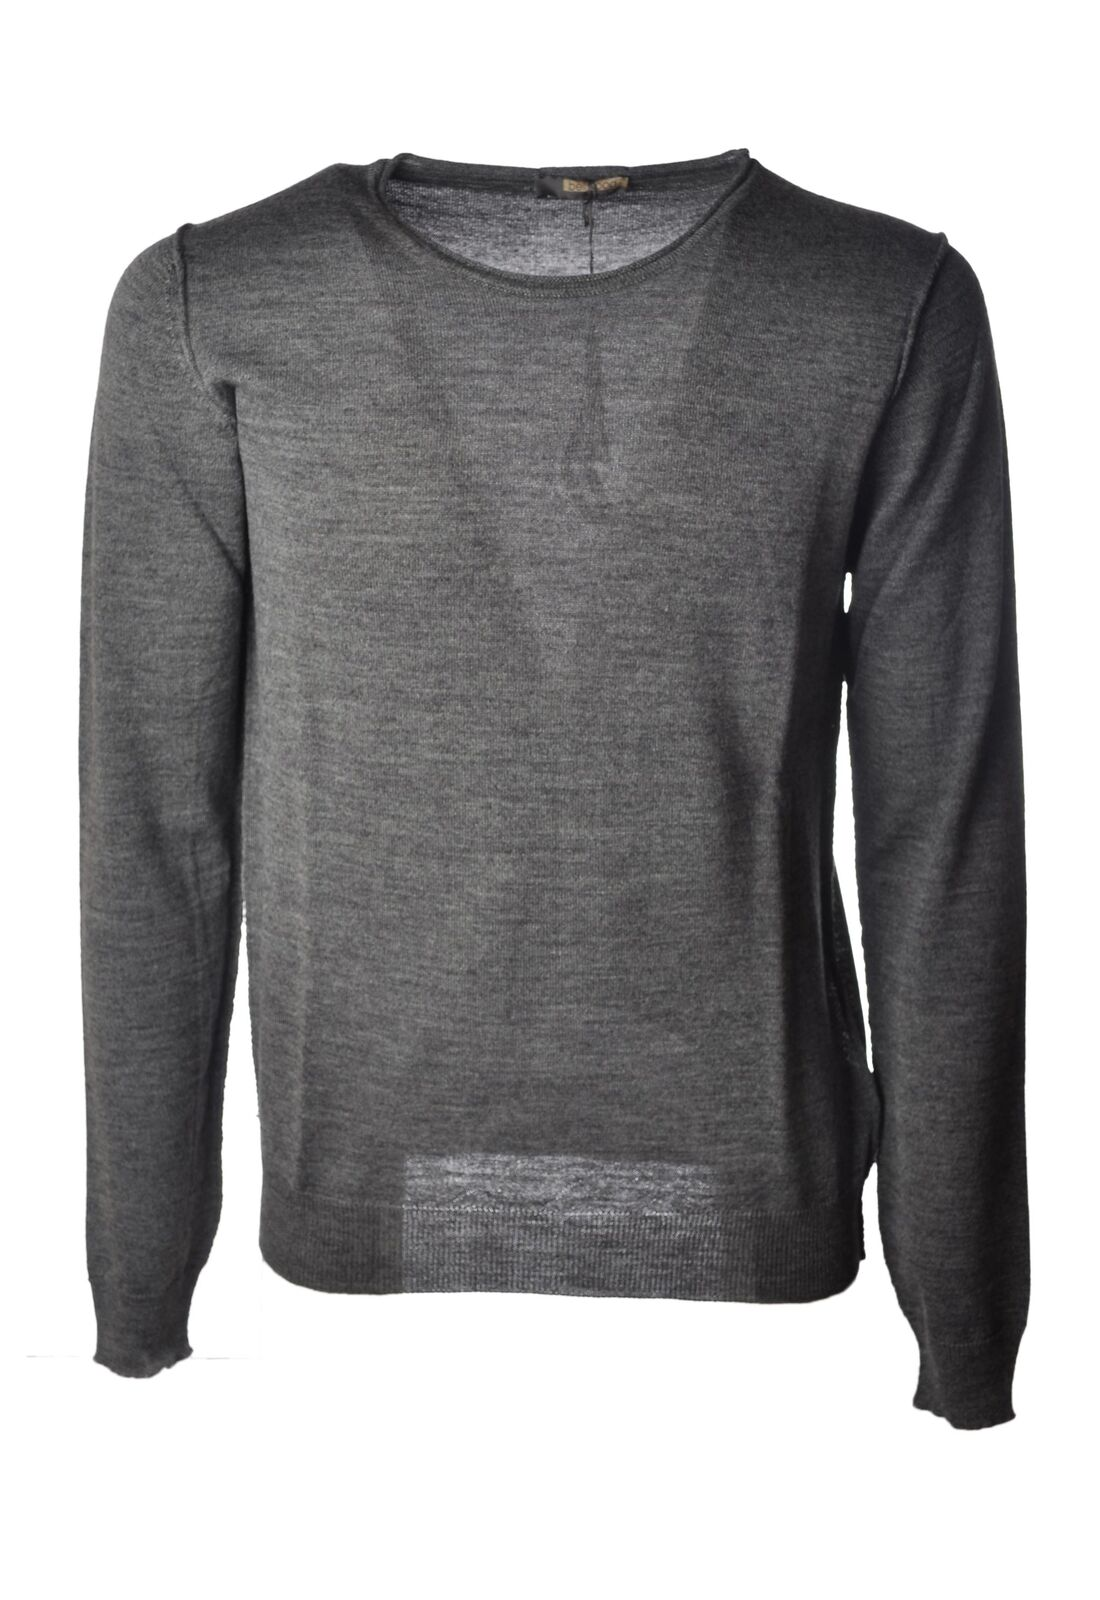 Bellwood  -  Sweaters - Male - Grau - 4162228A184125